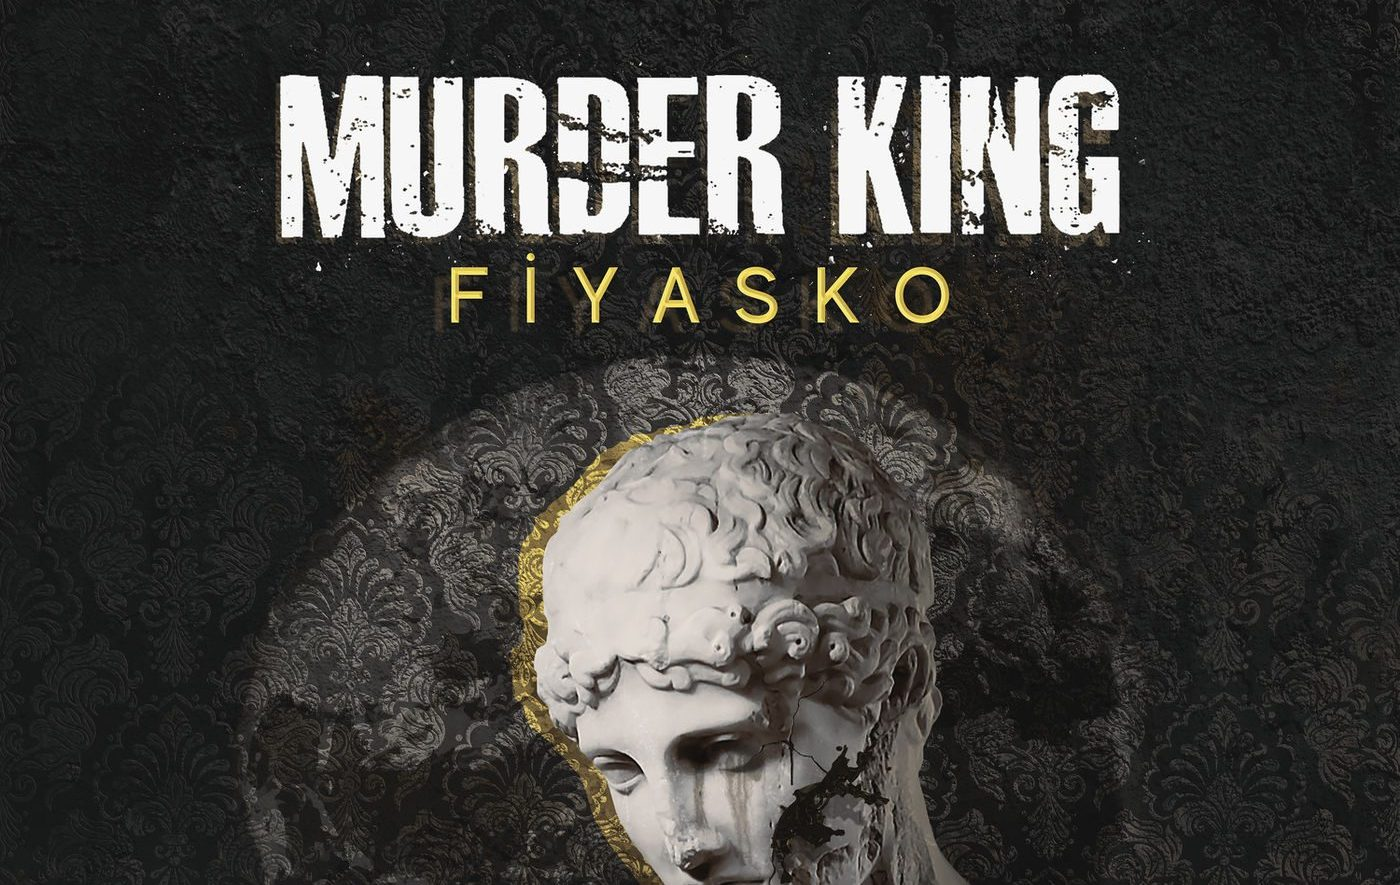 Murder King – Fiyasko